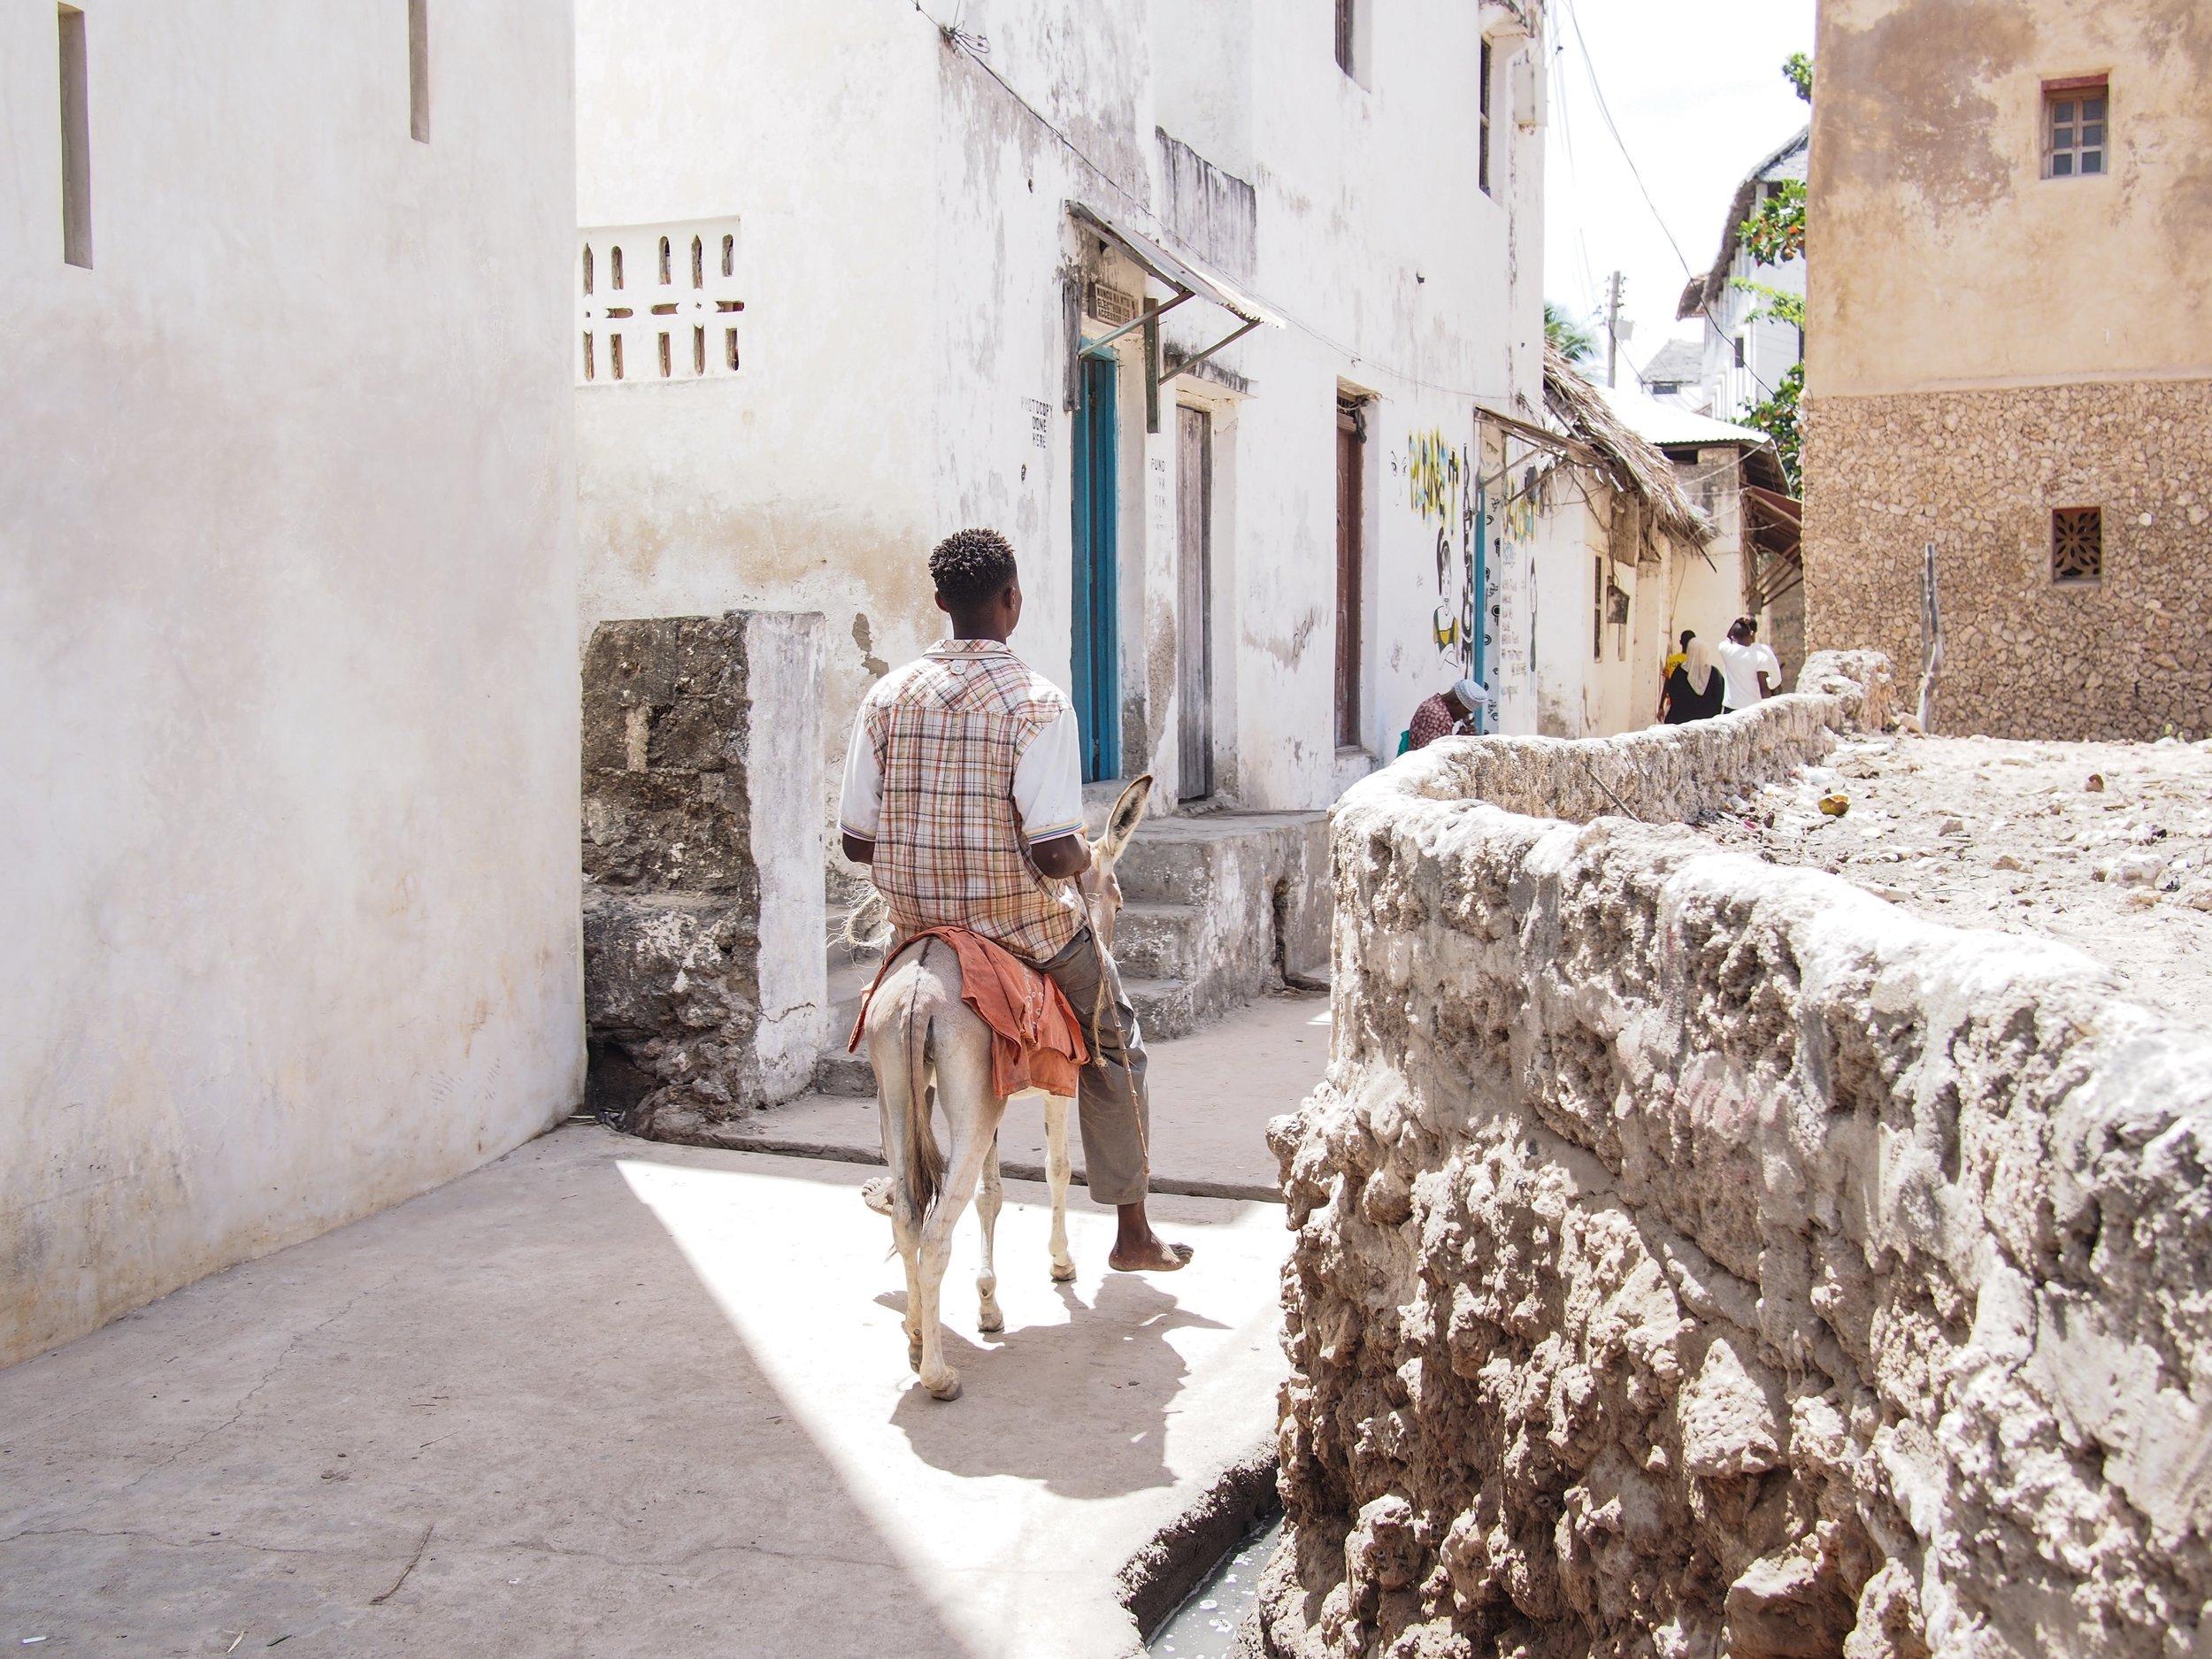 Lamu Globe + Tribe